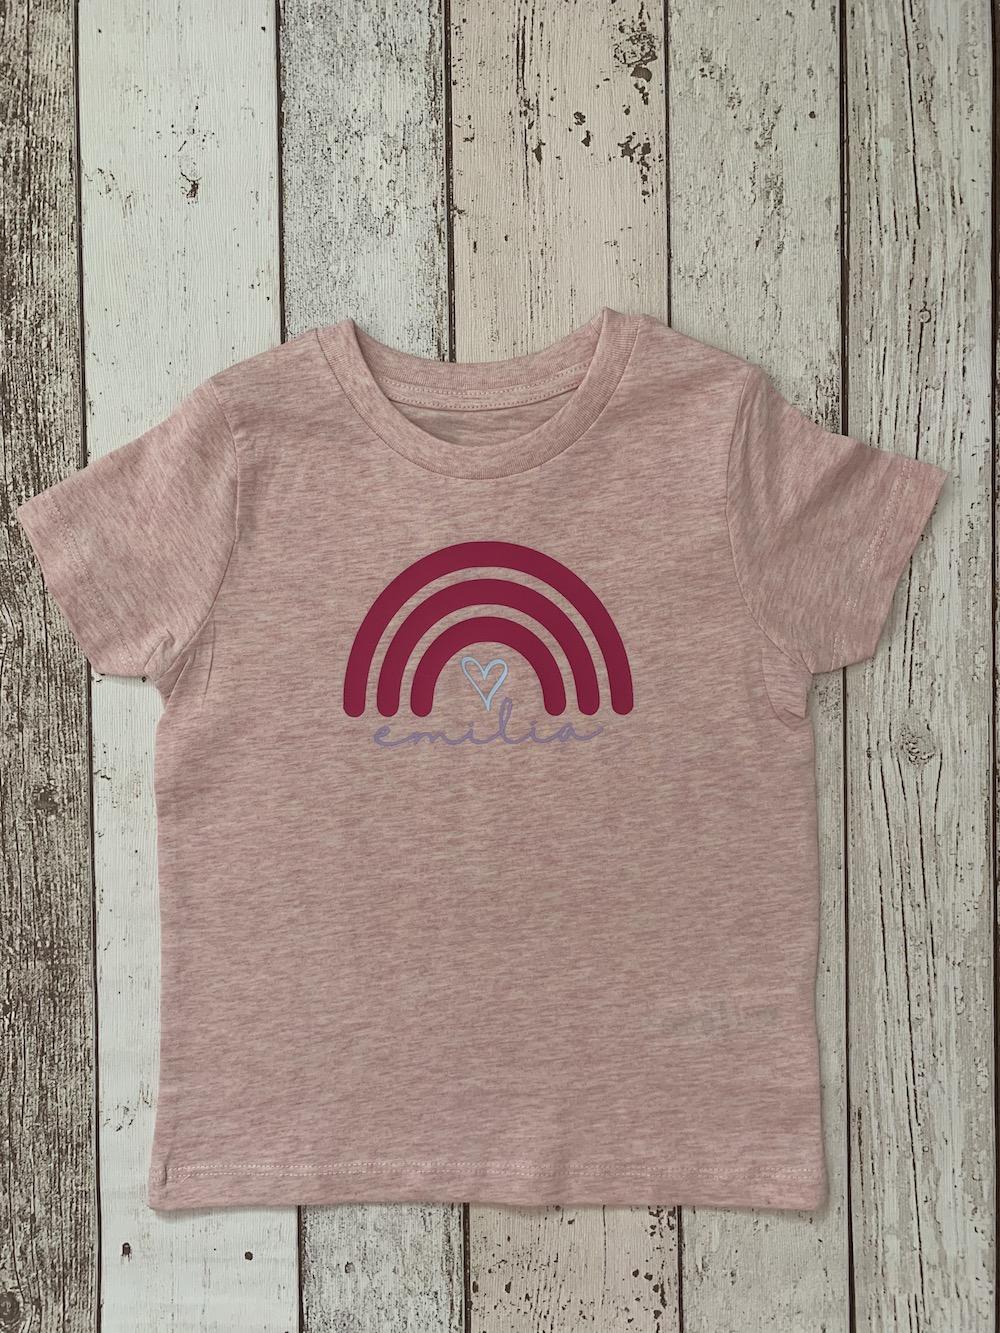 Rainbow Personalised Tshirt – Pink